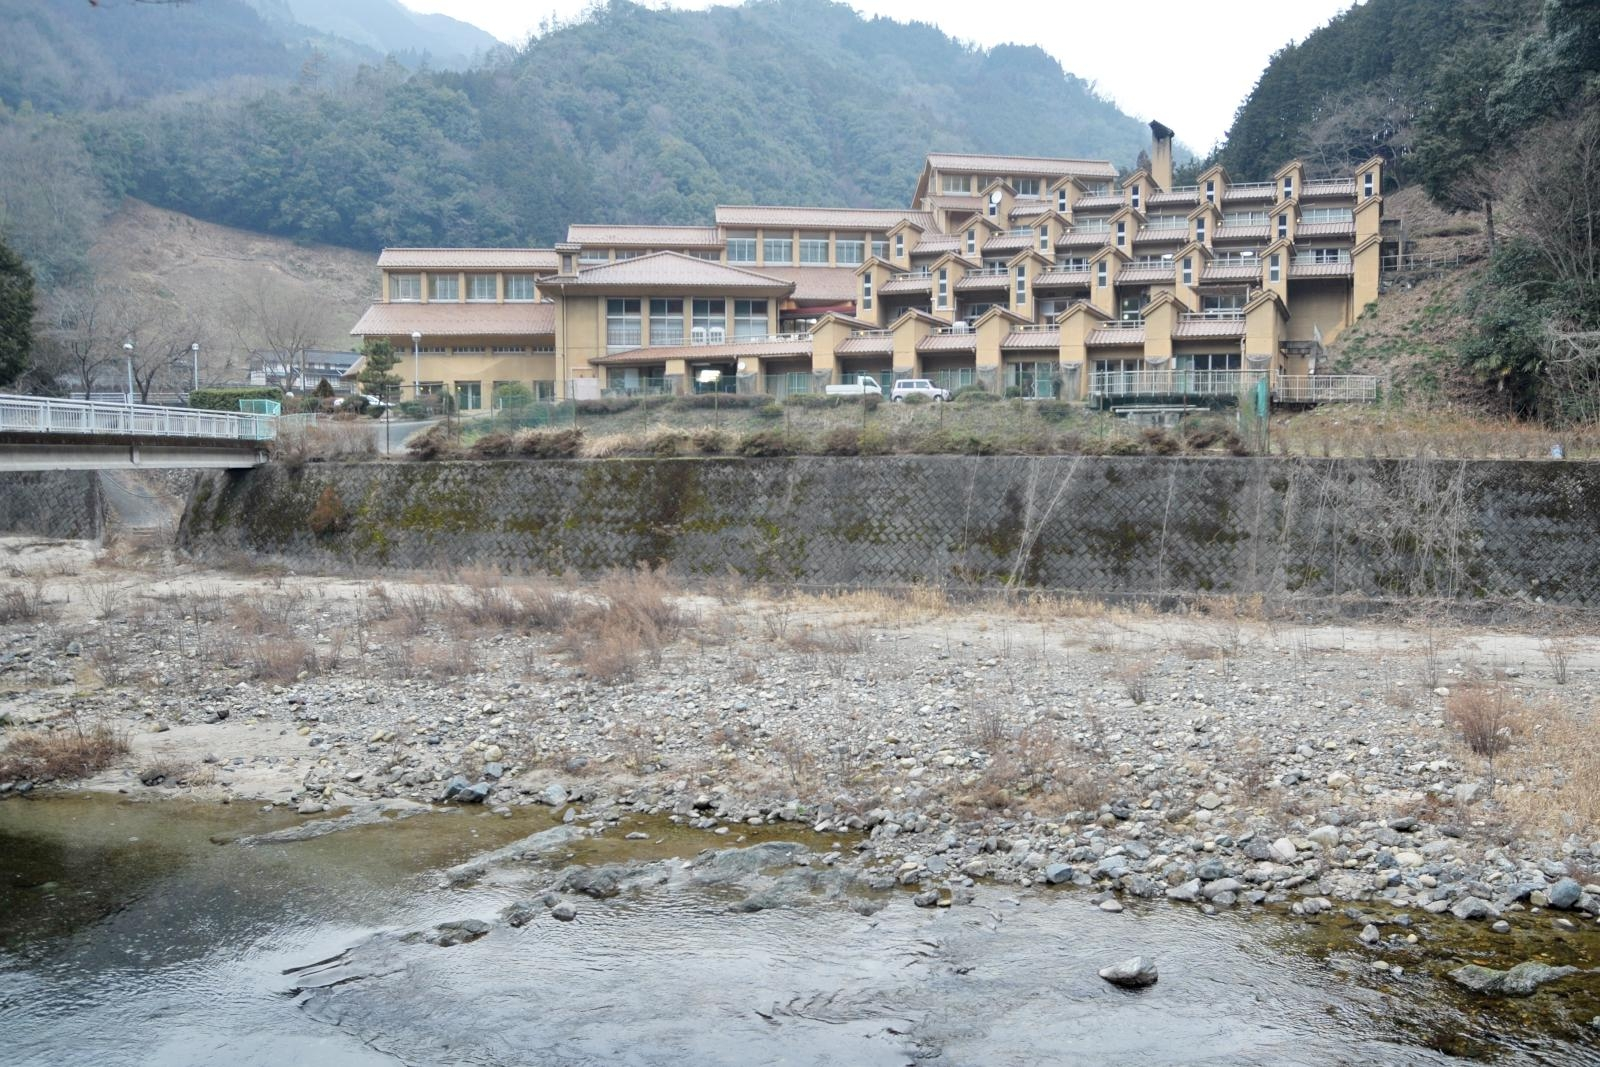 1. Sozukyo Onsen Resthouse